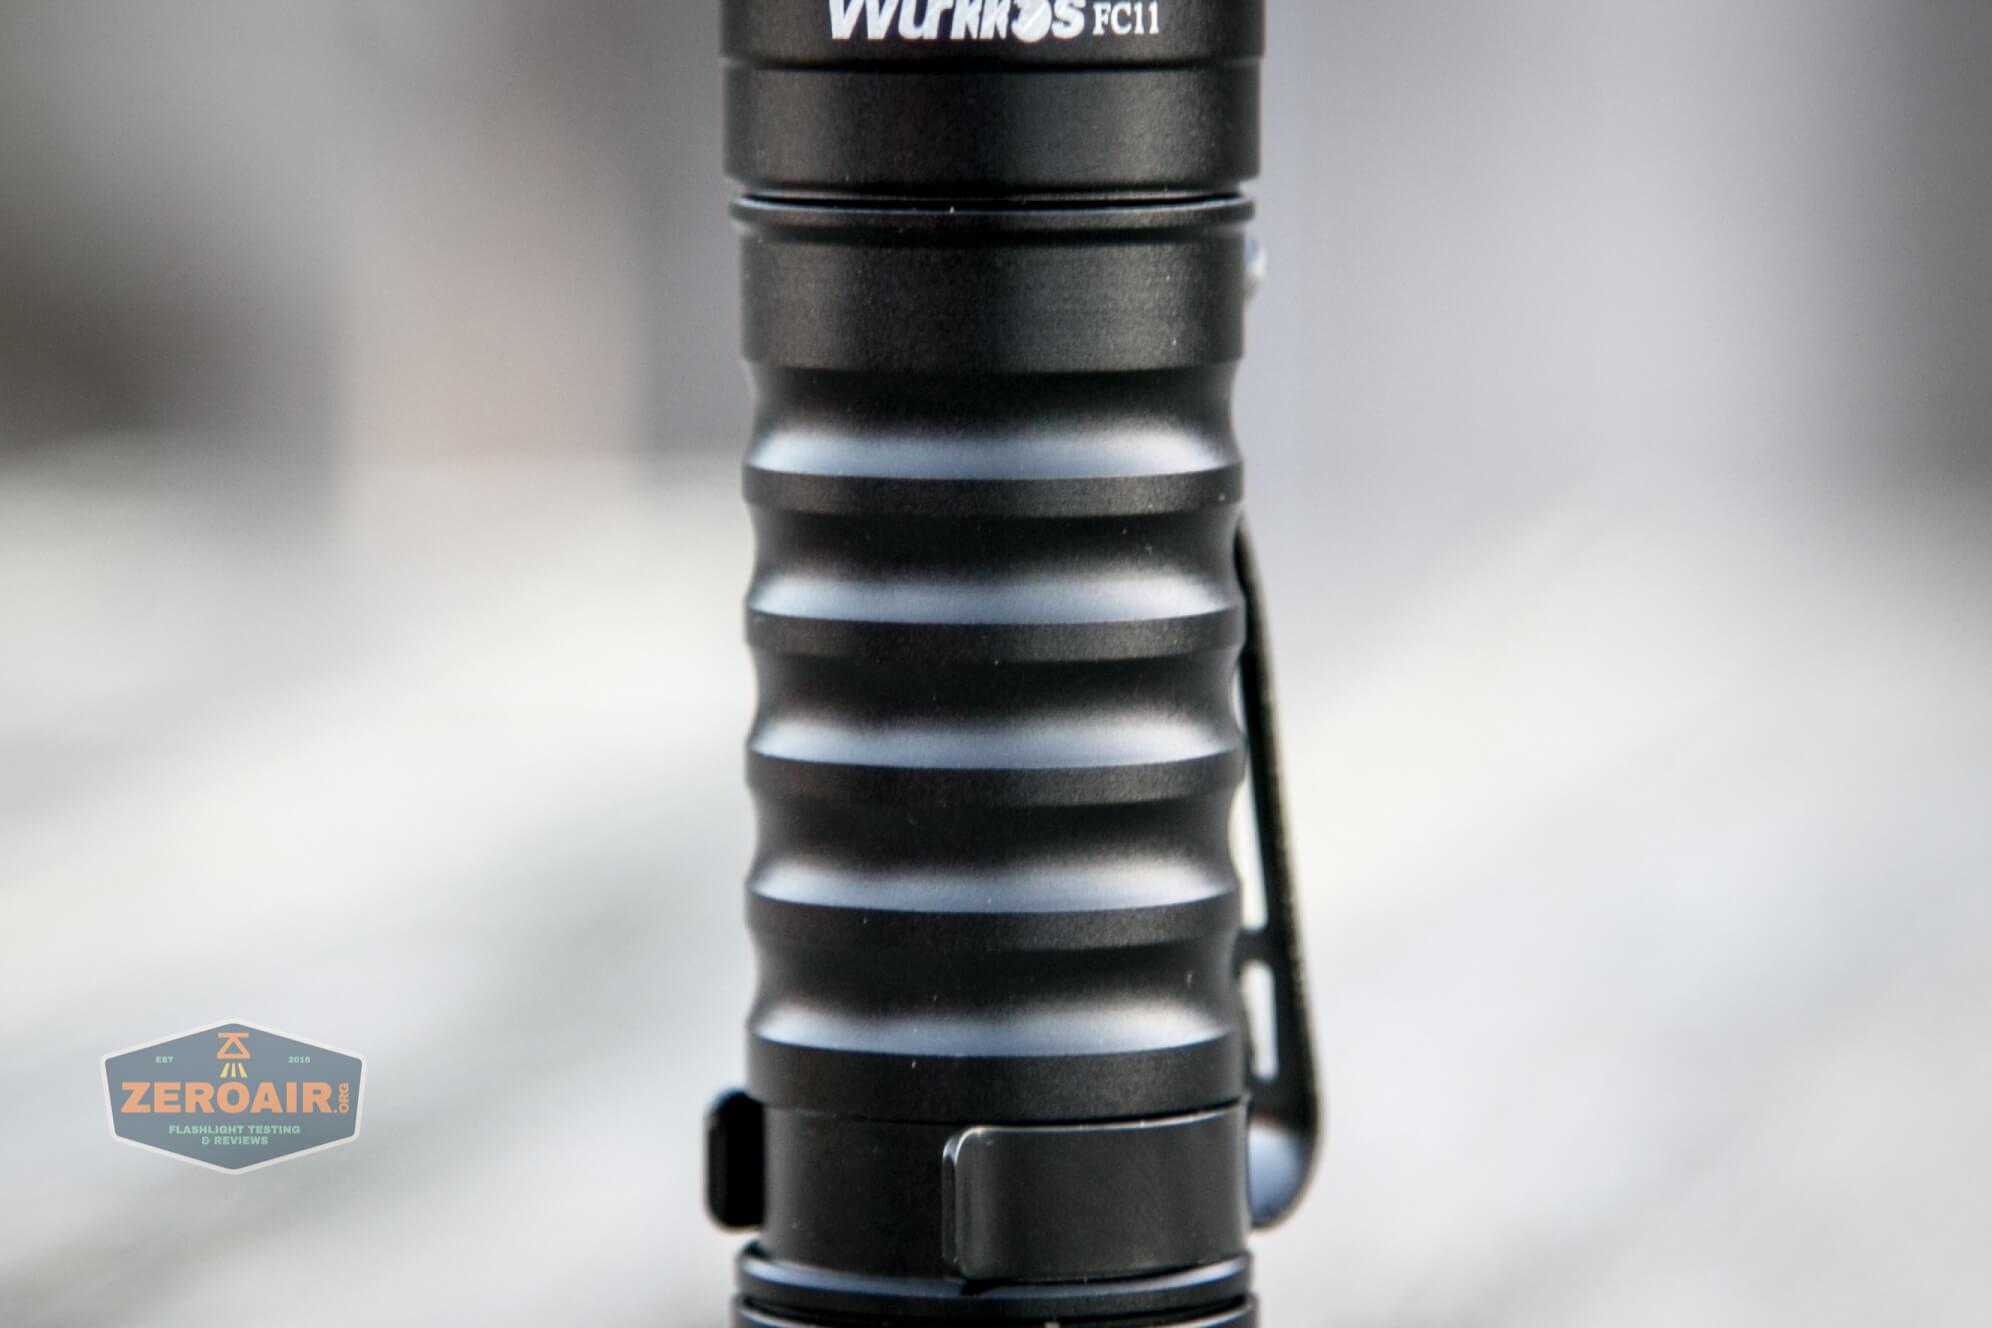 wurkkos fc11 flashlight body